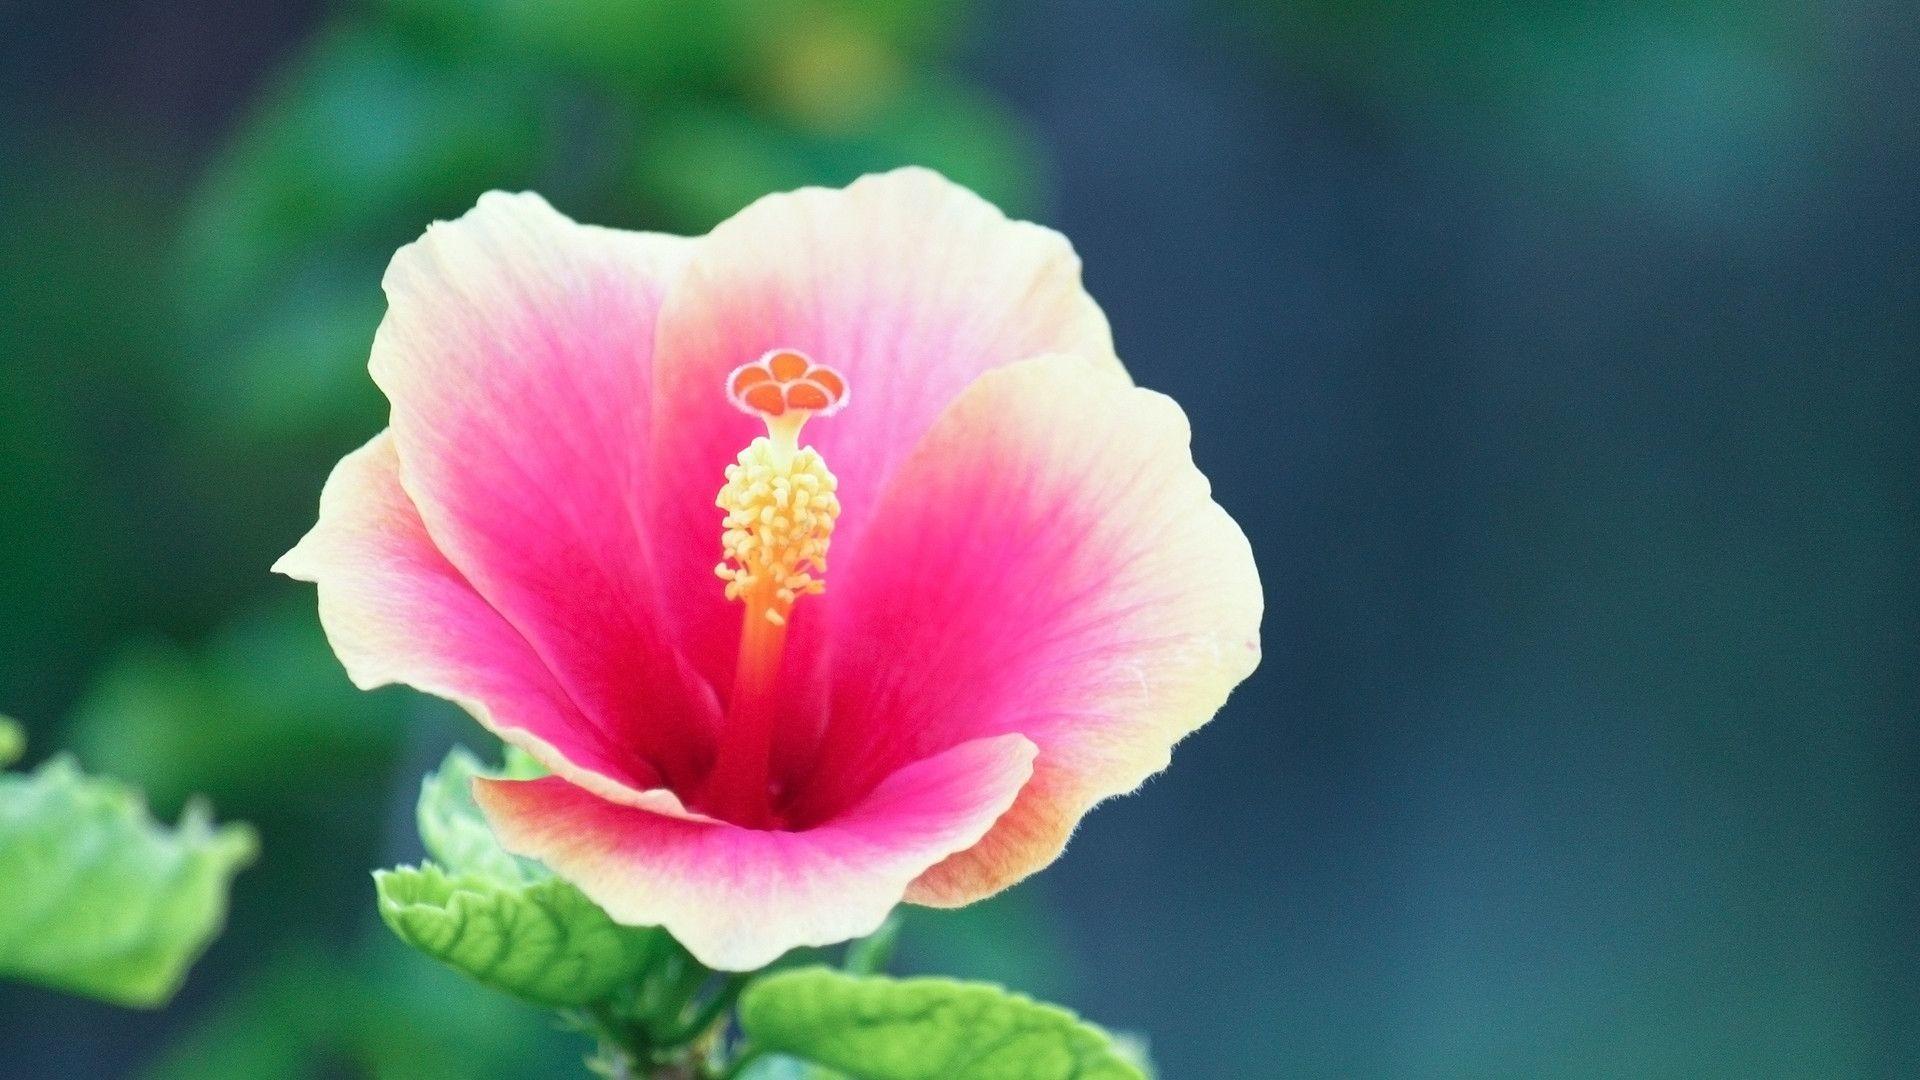 Res: 1920x1080, 8. hibiscus-flower-wallpaper8-2-600x338